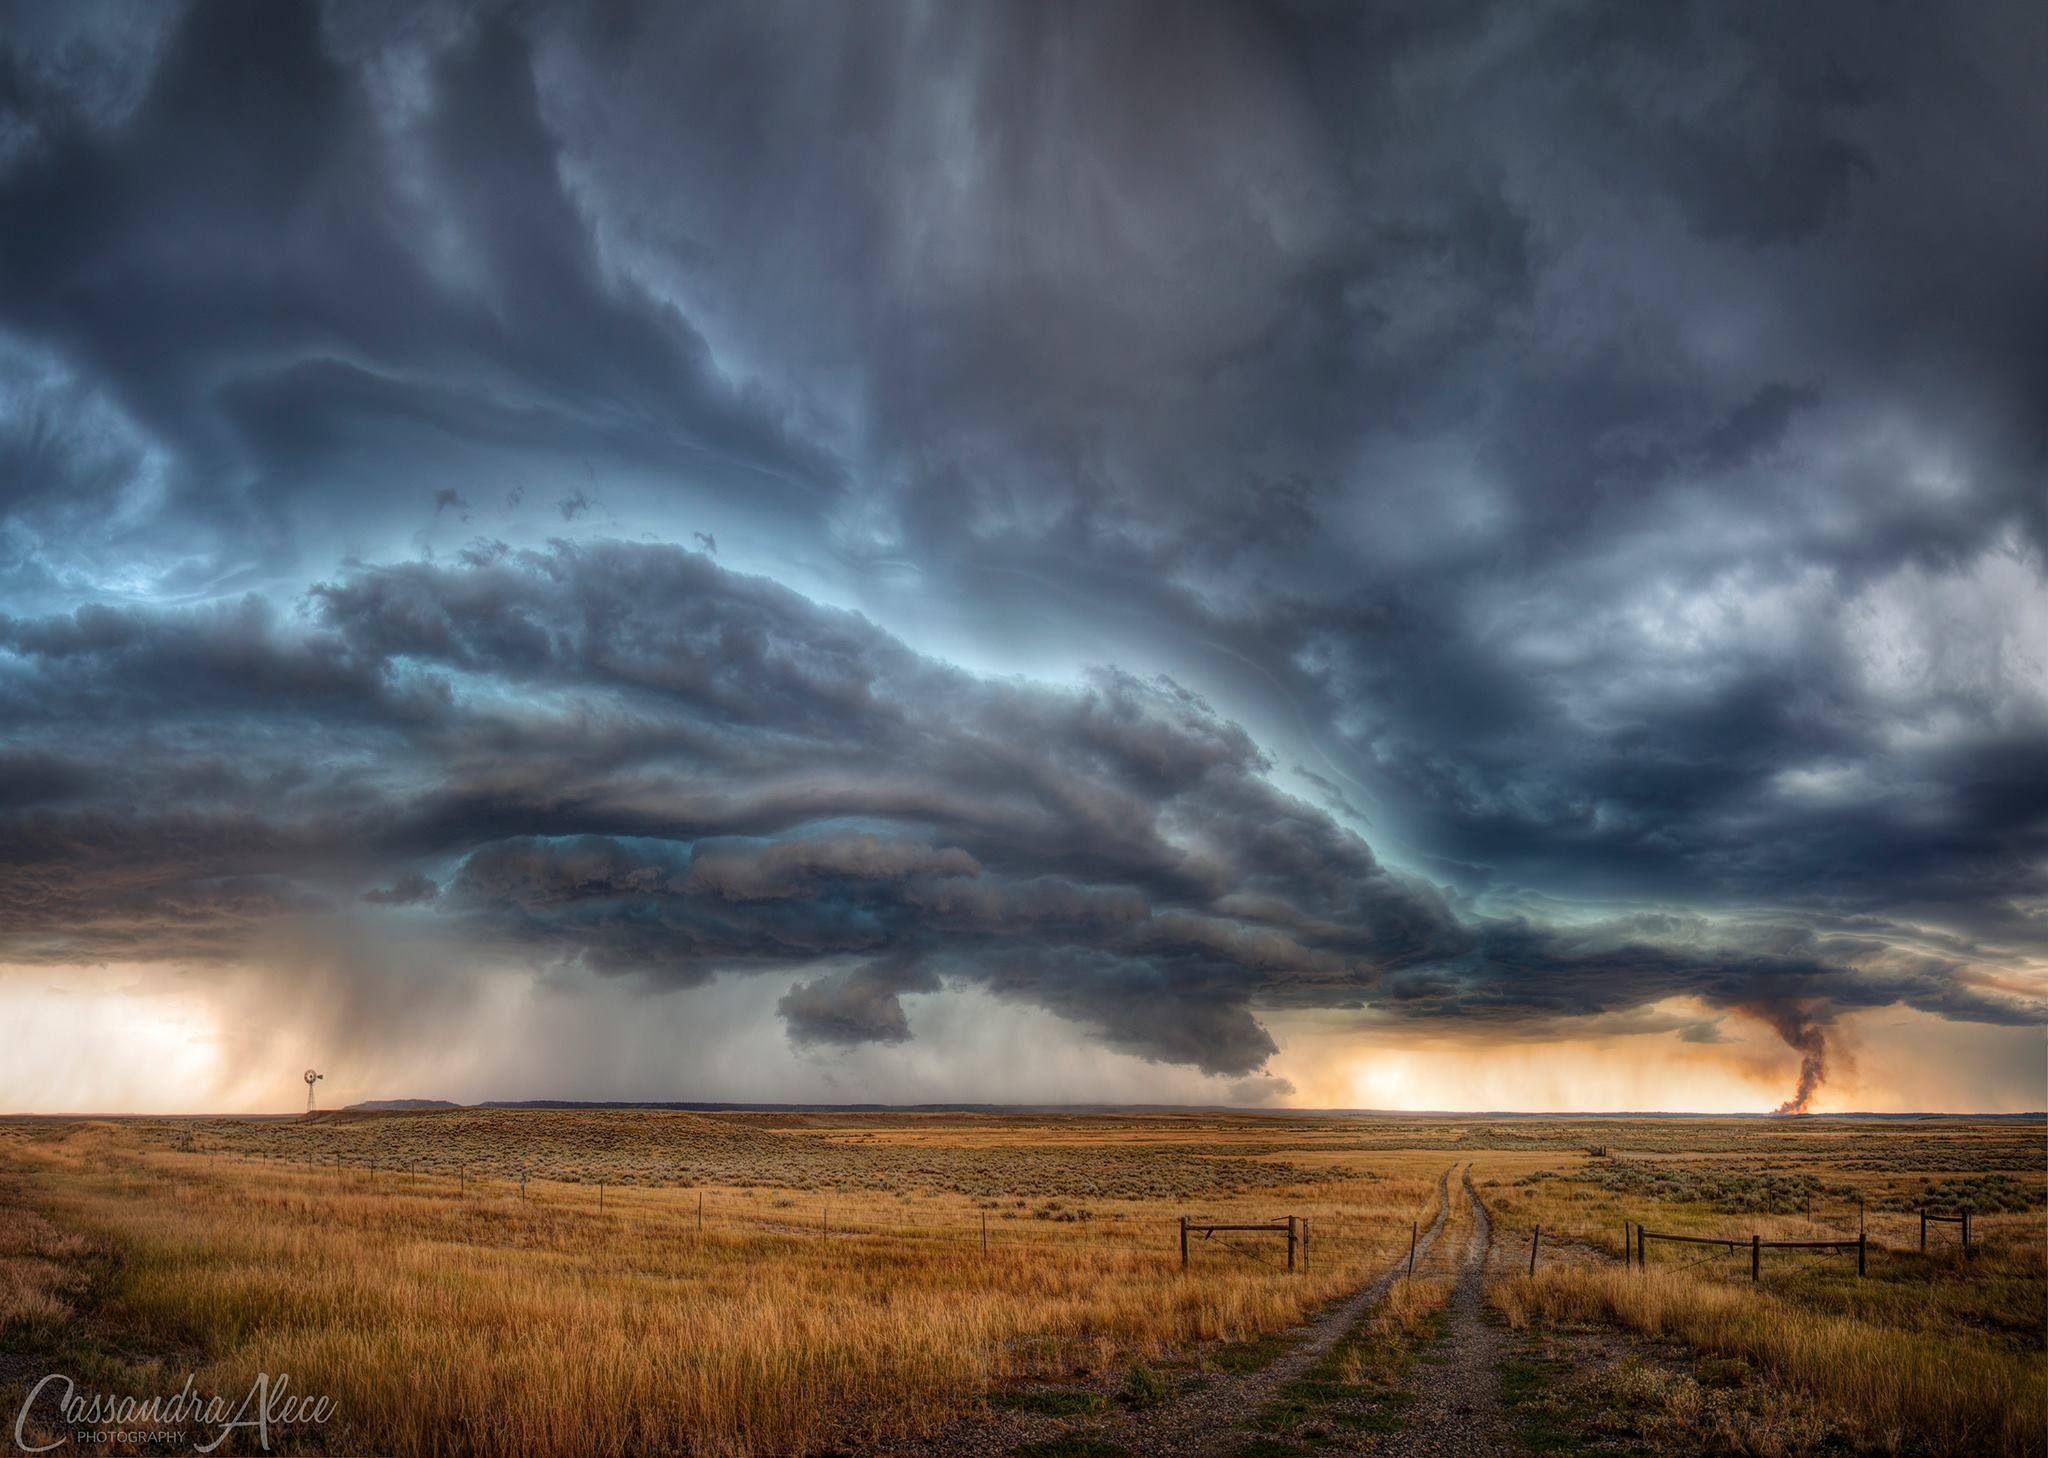 6/19/2015 Montana & Wyoming Severe Storms - YouTube